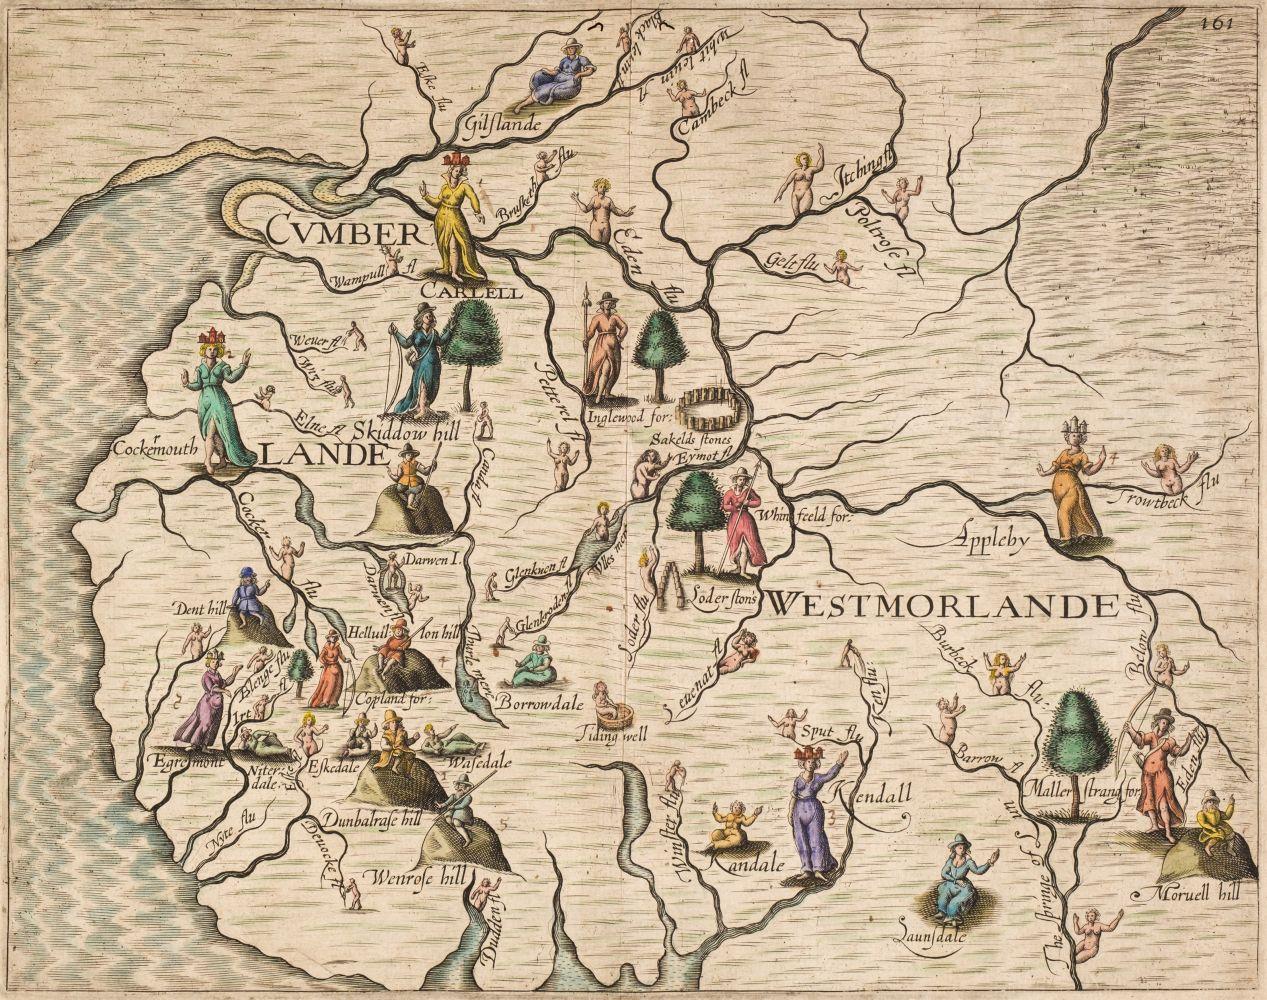 Cumberland & Westmorland. Drayton (Michael), Untitled allegorical map, 1622